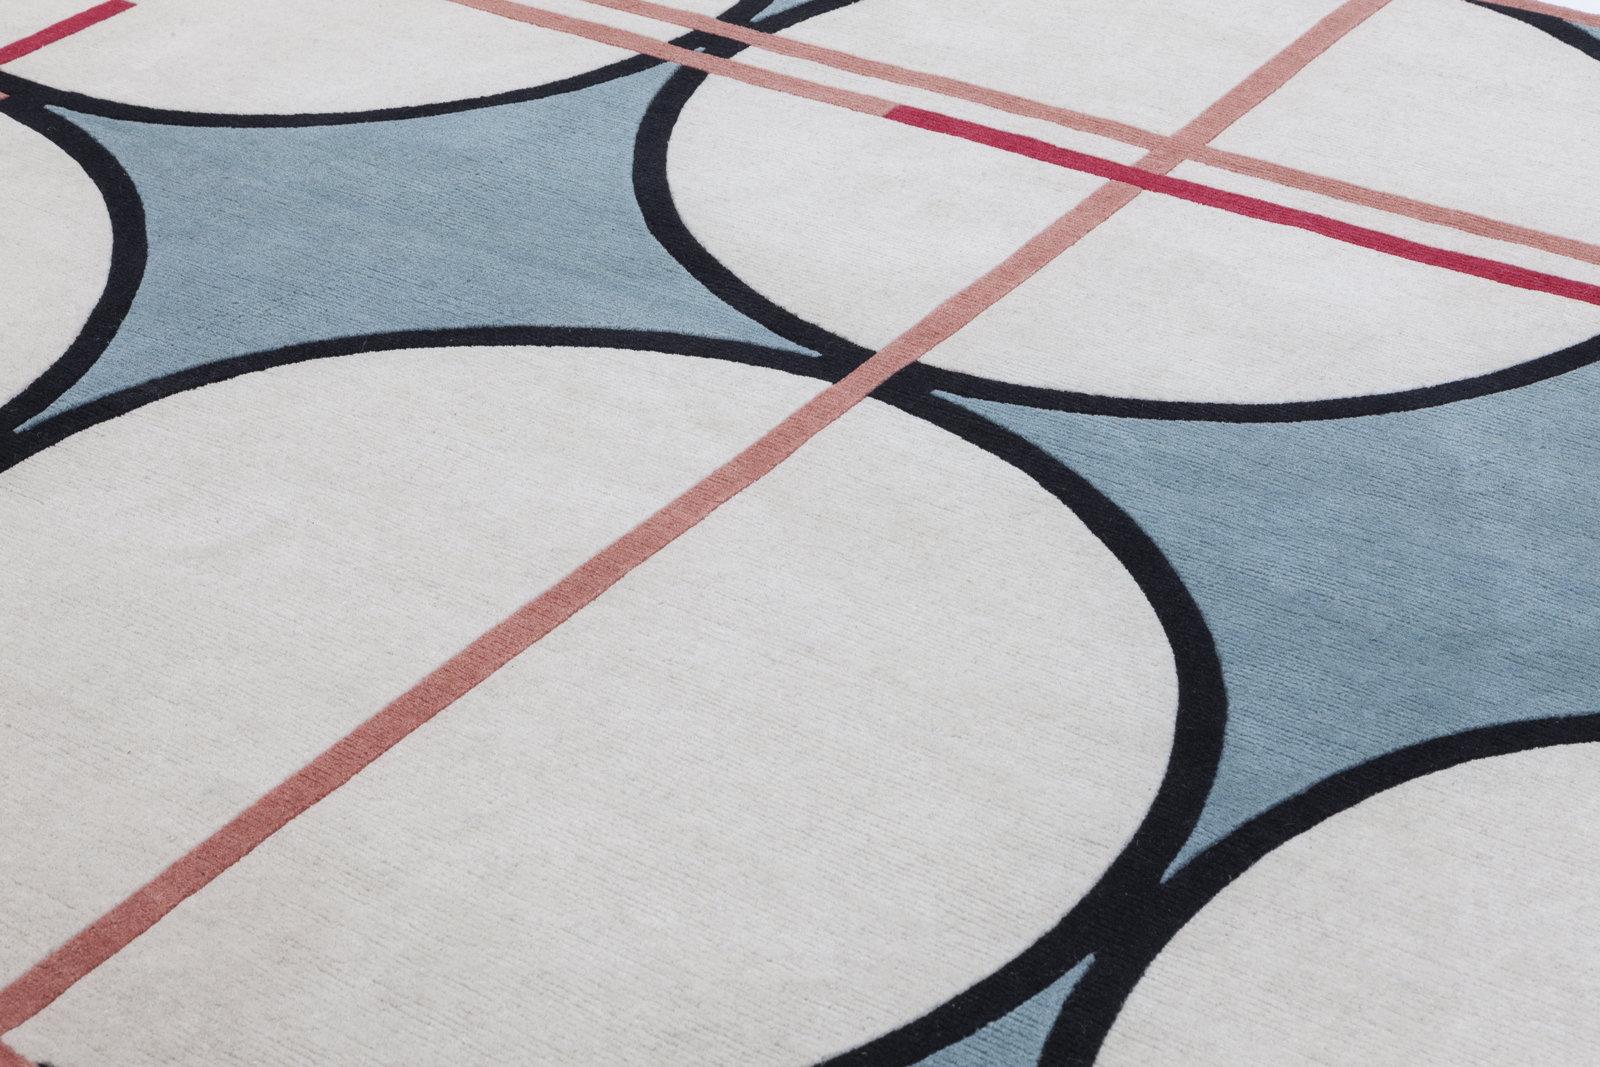 Credenza Peru : Credenza rug designed by federico pepe and patricia urquiola